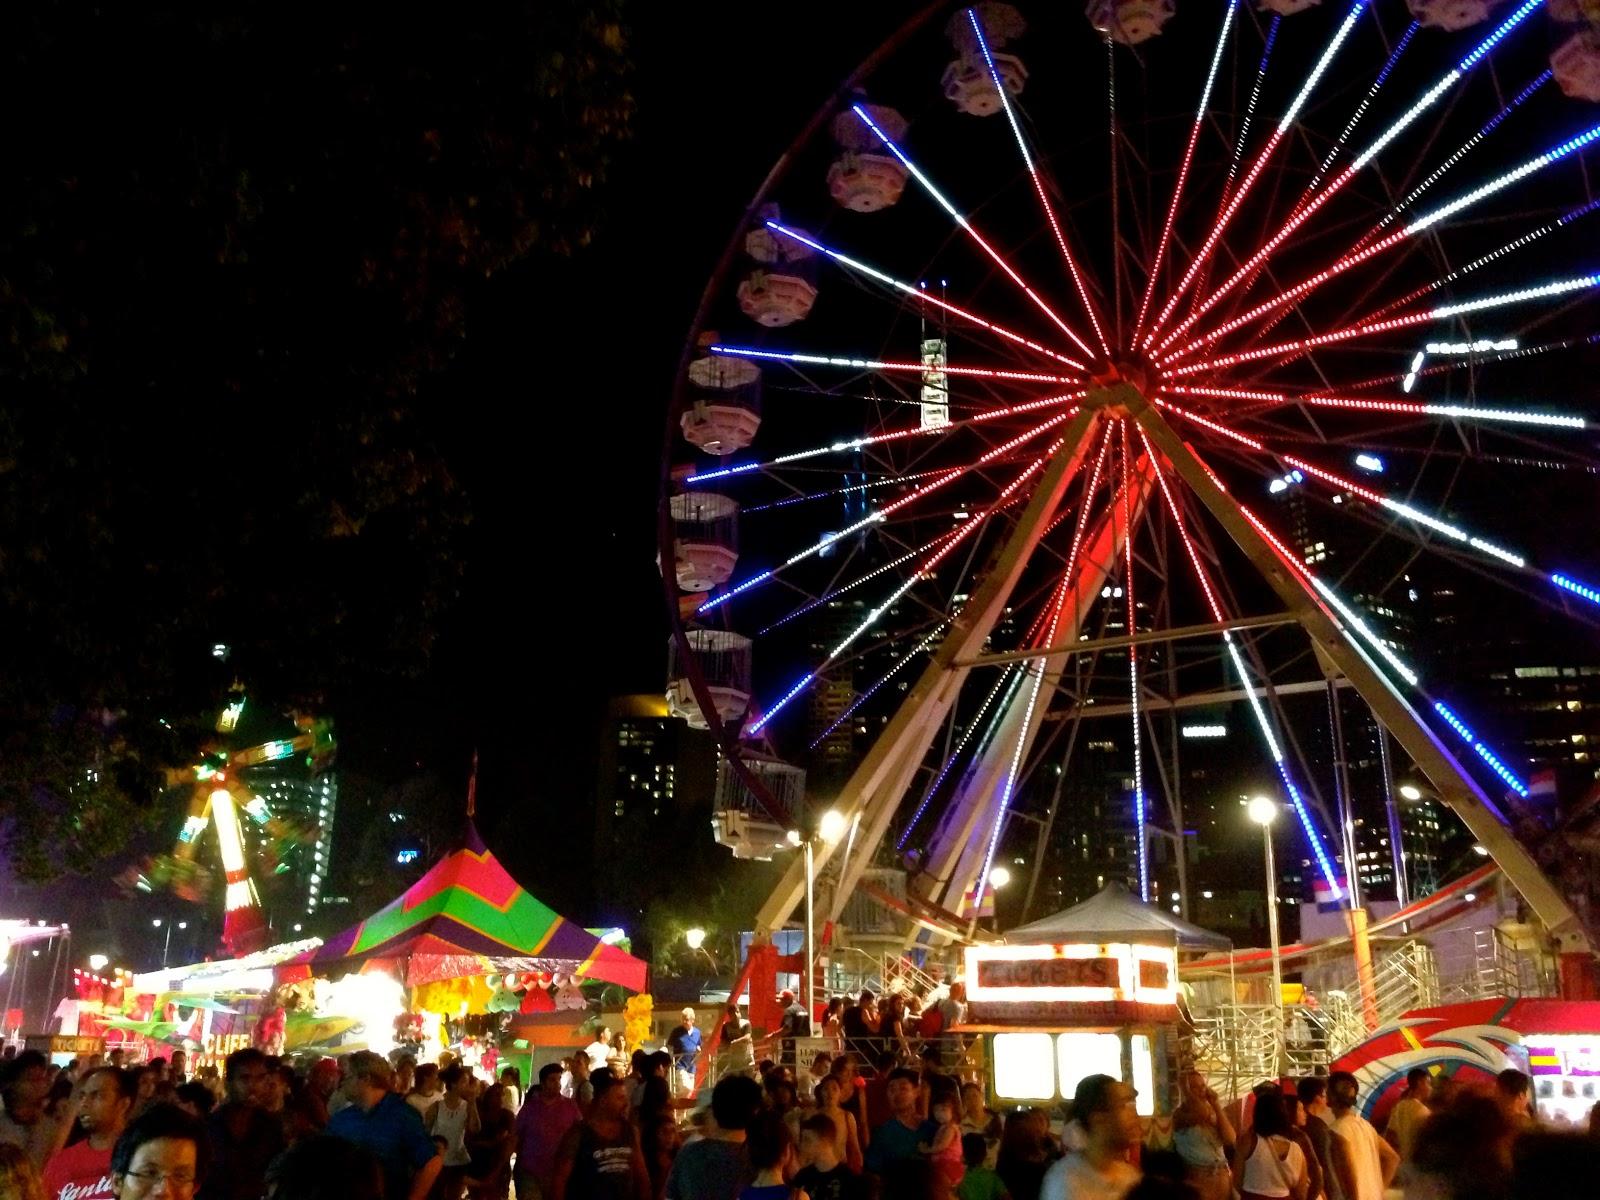 eУ °ọ°: Moomba Festival